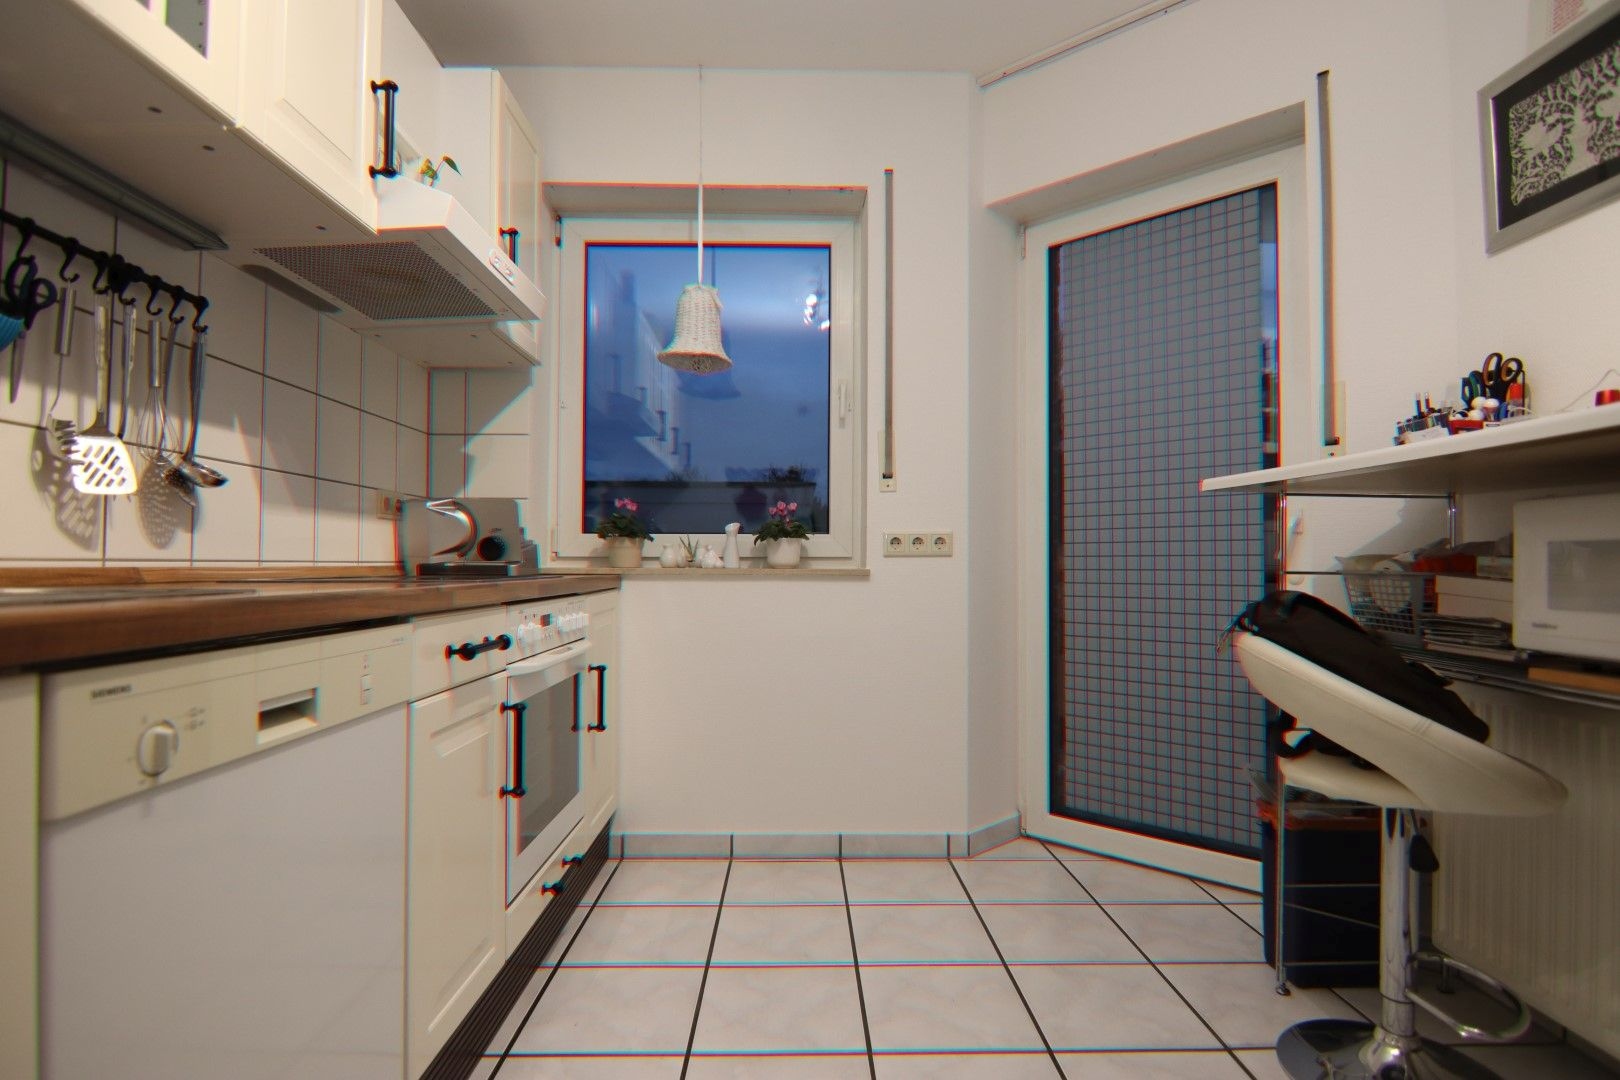 Immobilie Nr.0288 | Heckenend 3, 41352 Korschenbroich